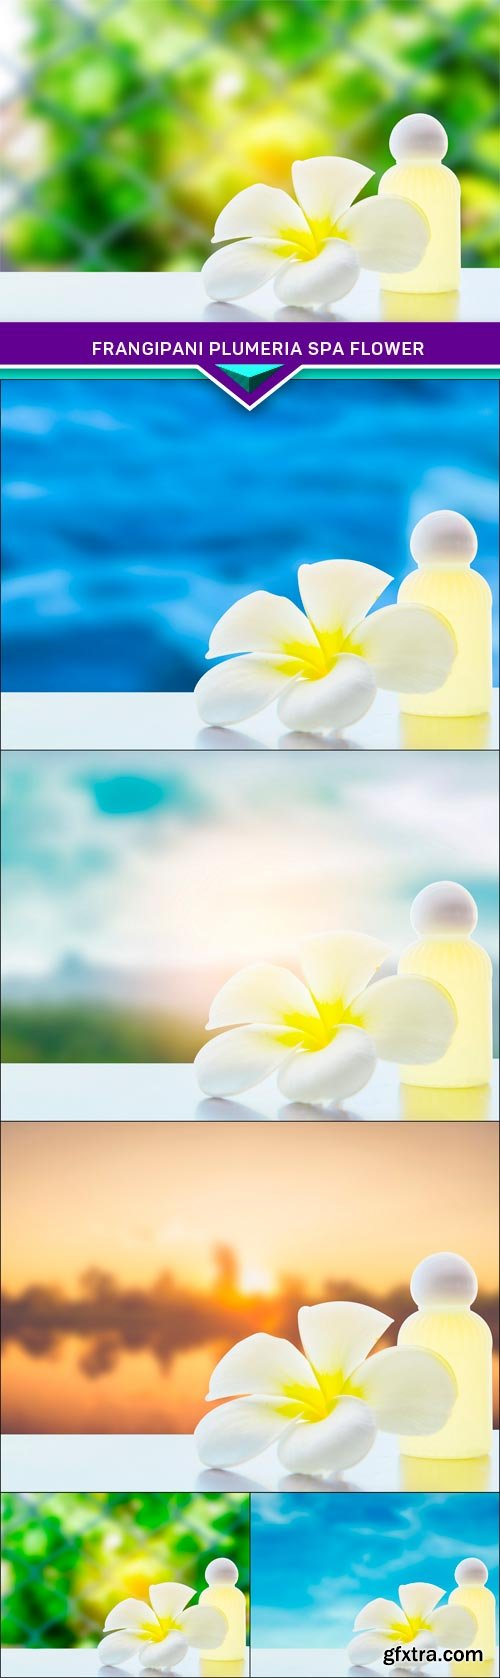 Frangipani plumeria Spa Flower 5X JPEG